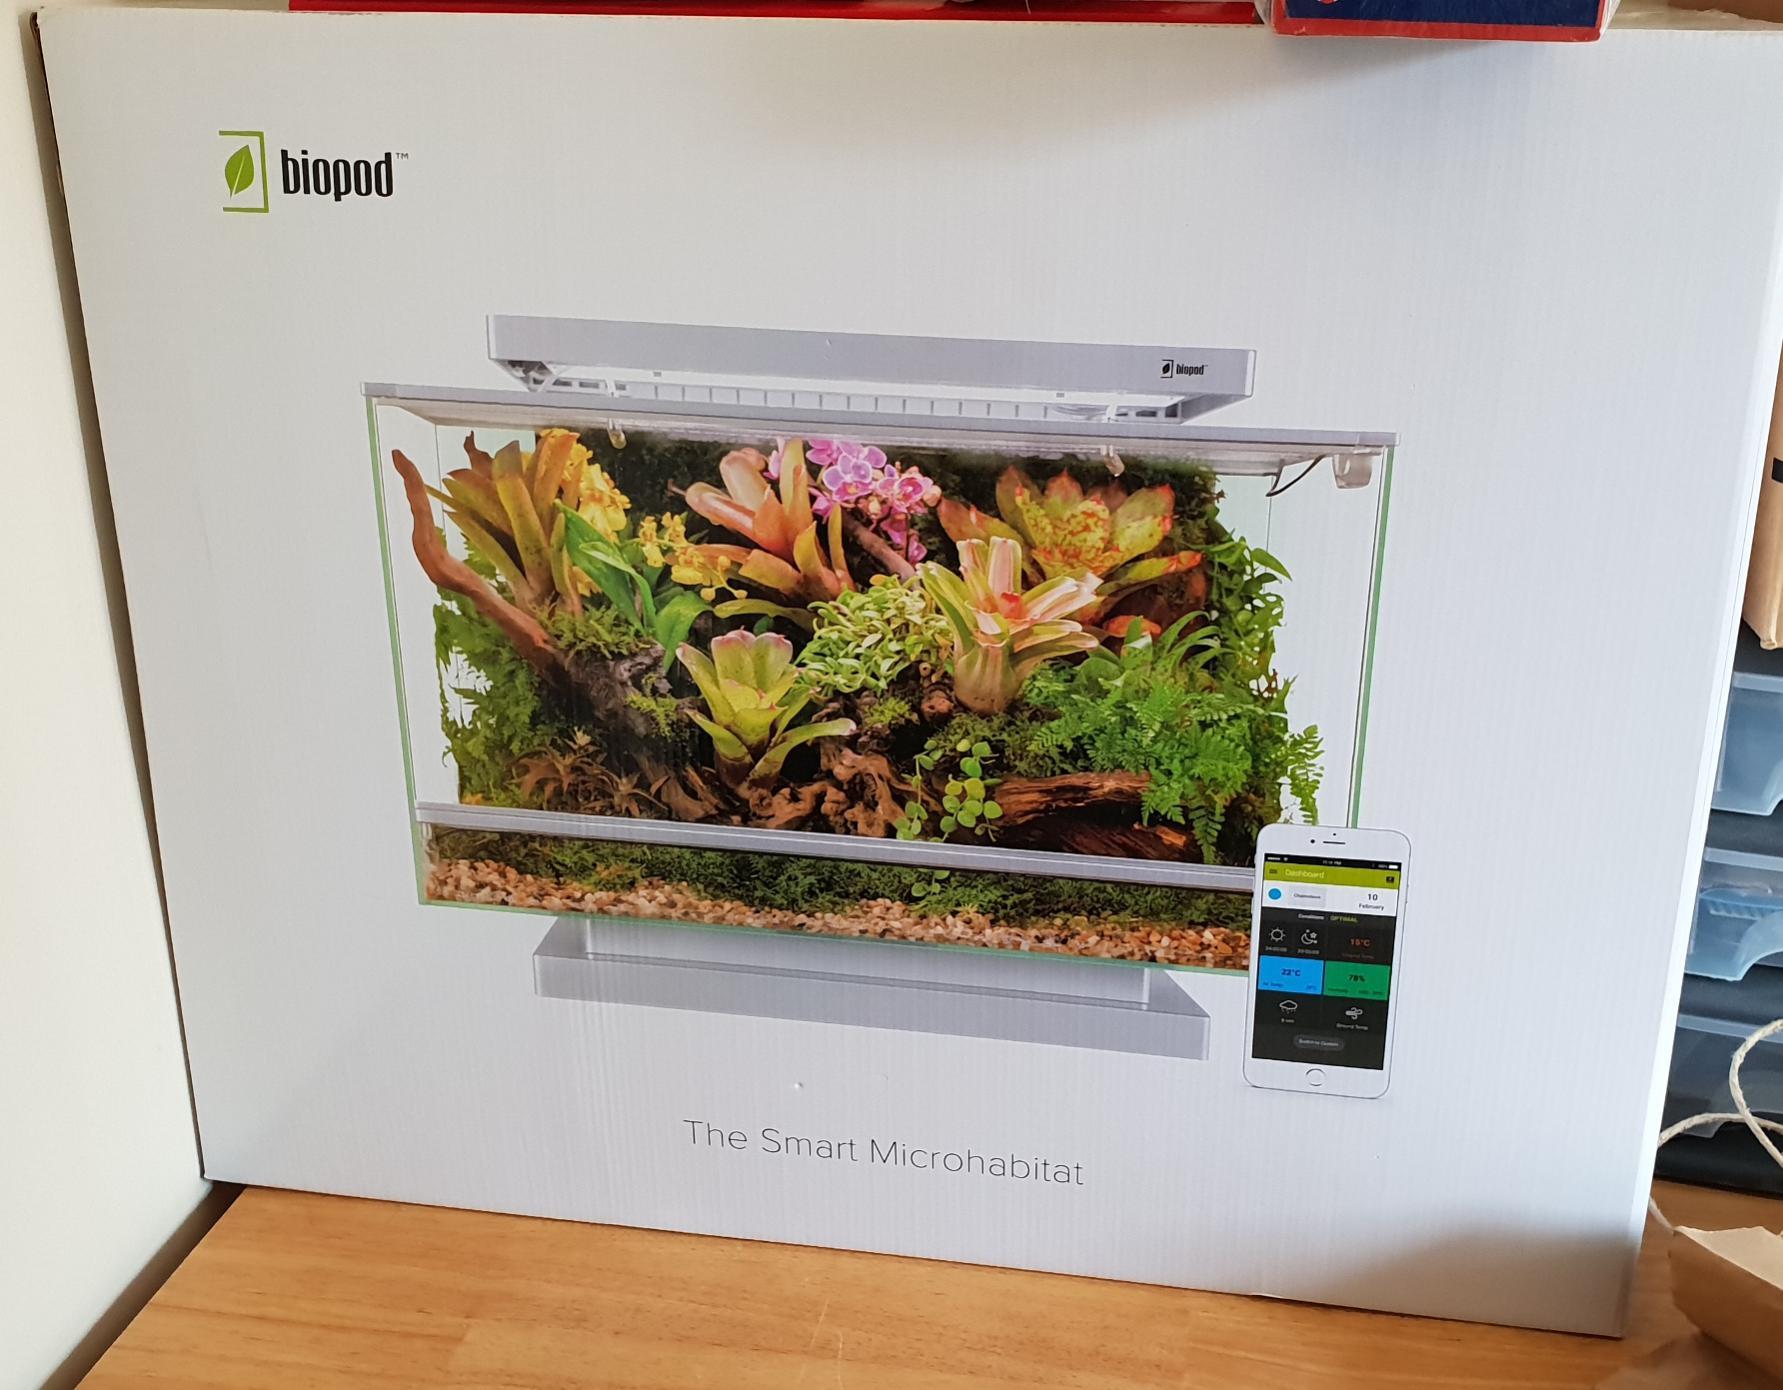 Biopod terra smart microhabitat for sale-20180711_170050.jpg